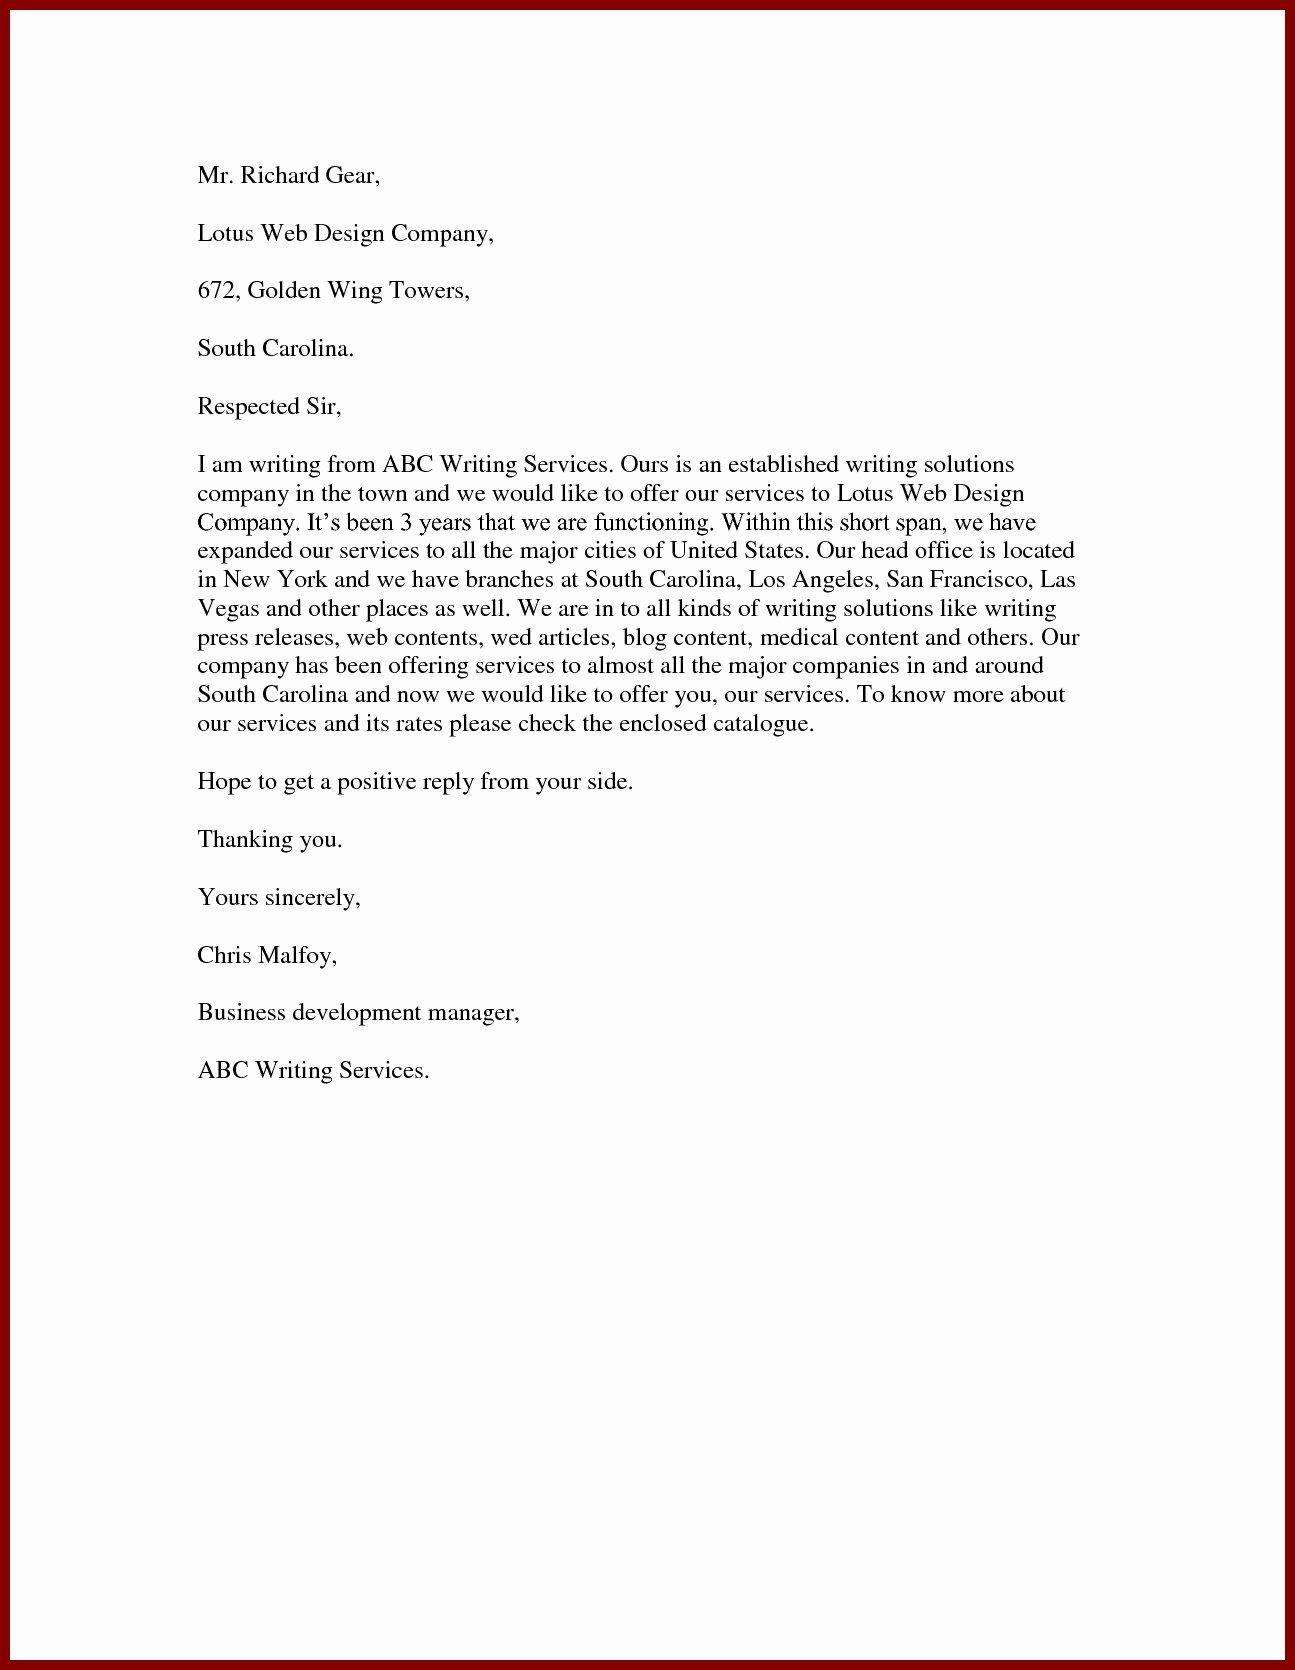 Service Offering Letter Beautiful Best Ideas Sample Fer Letter for Business Development